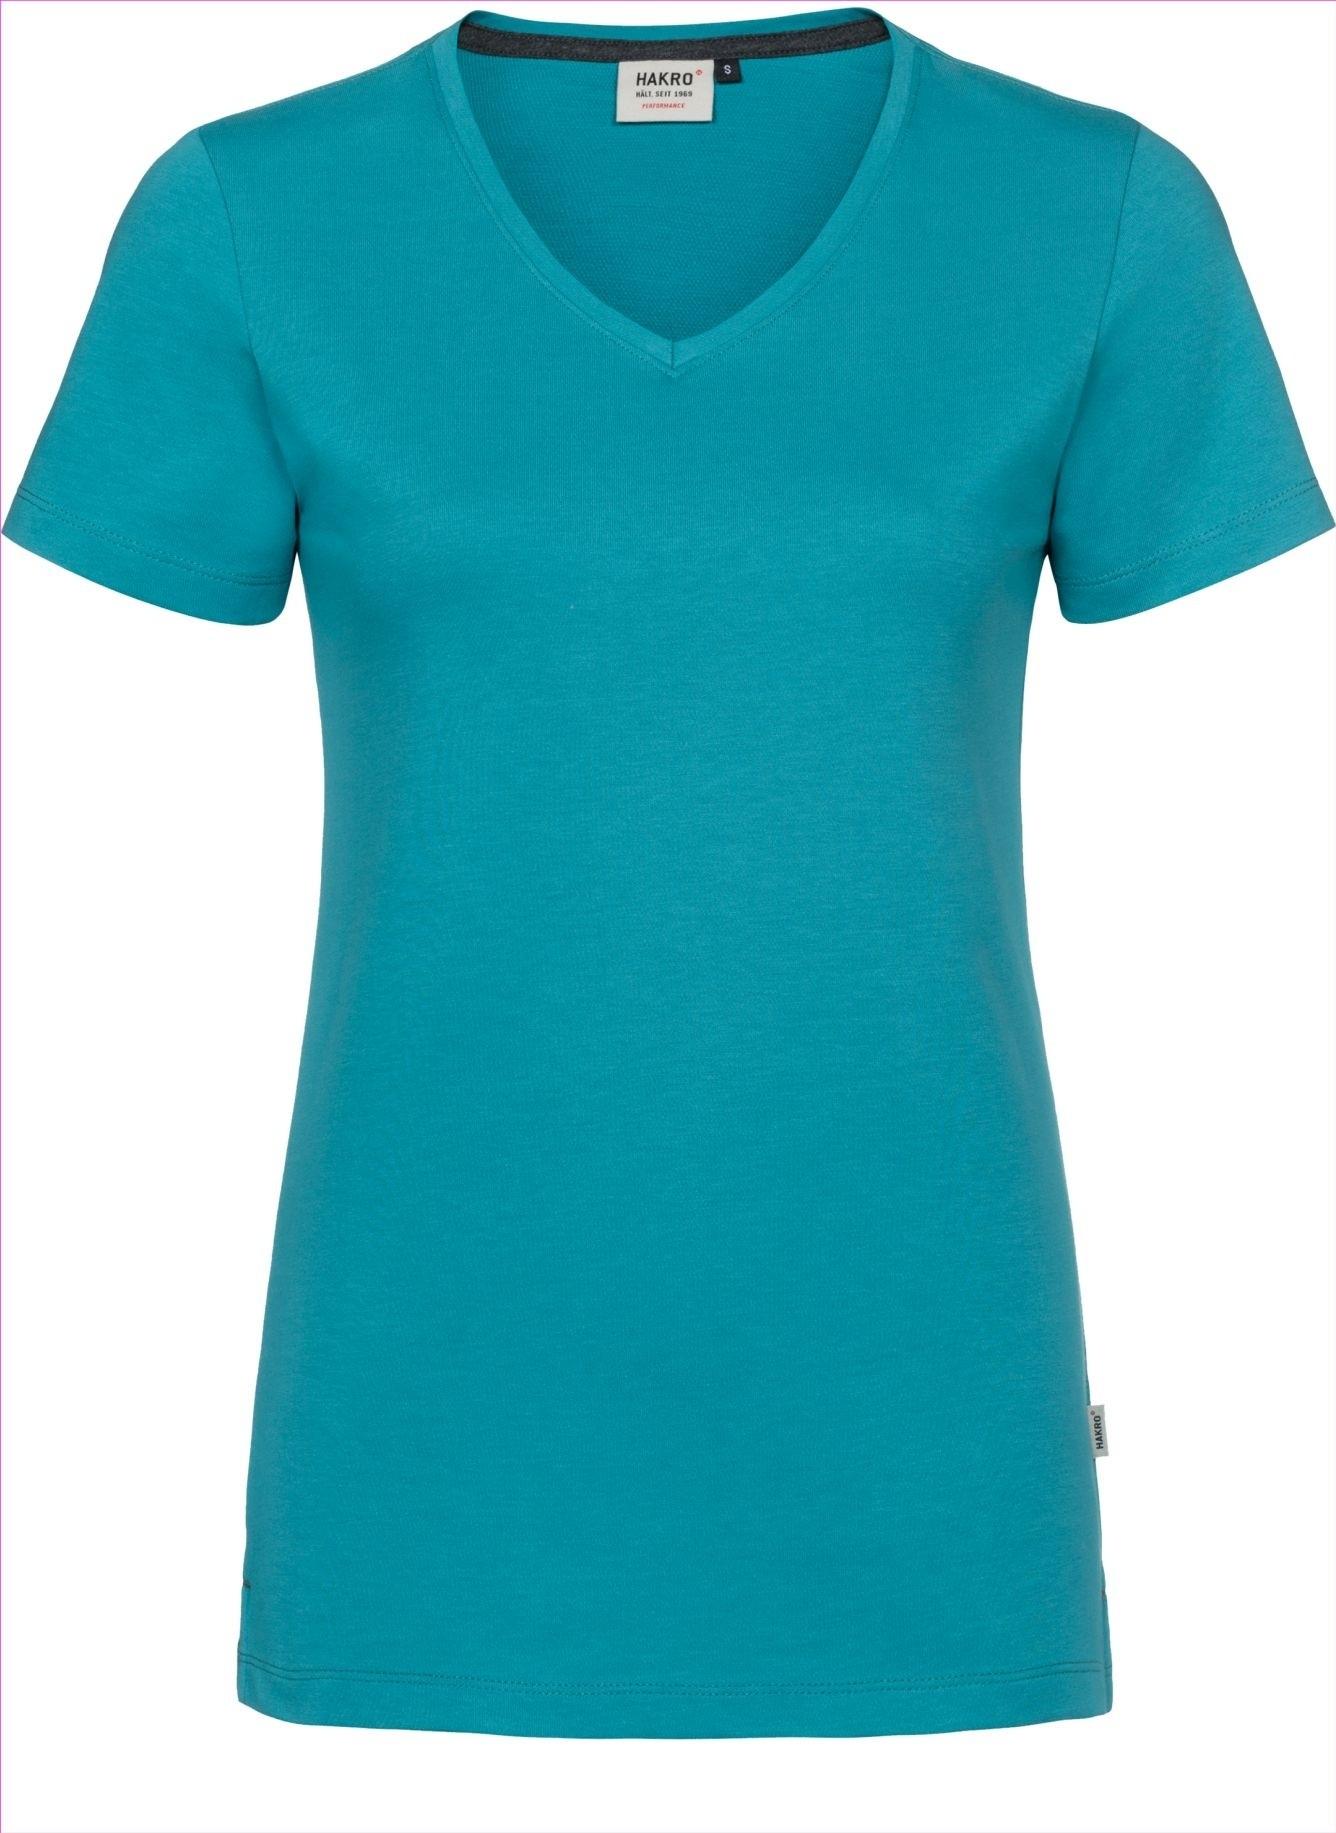 HAKRO V-Shirt Cotton-Tec Damen